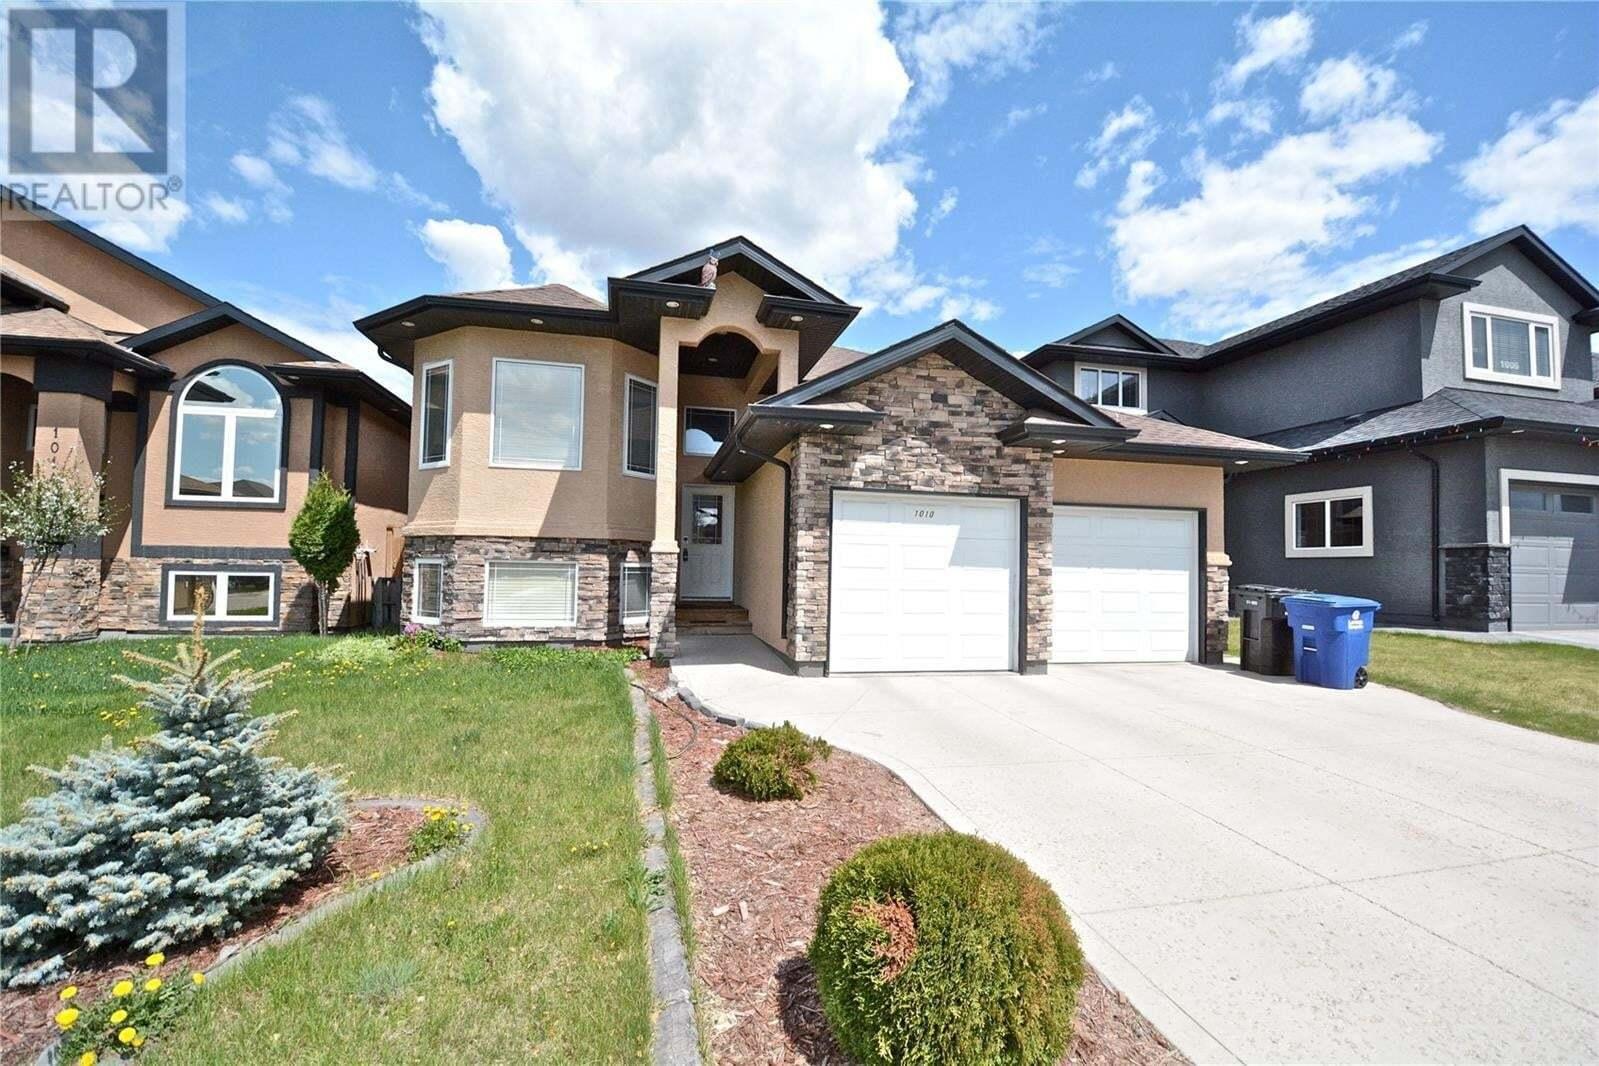 House for sale at 1010 Muzyka Rd Saskatoon Saskatchewan - MLS: SK820802